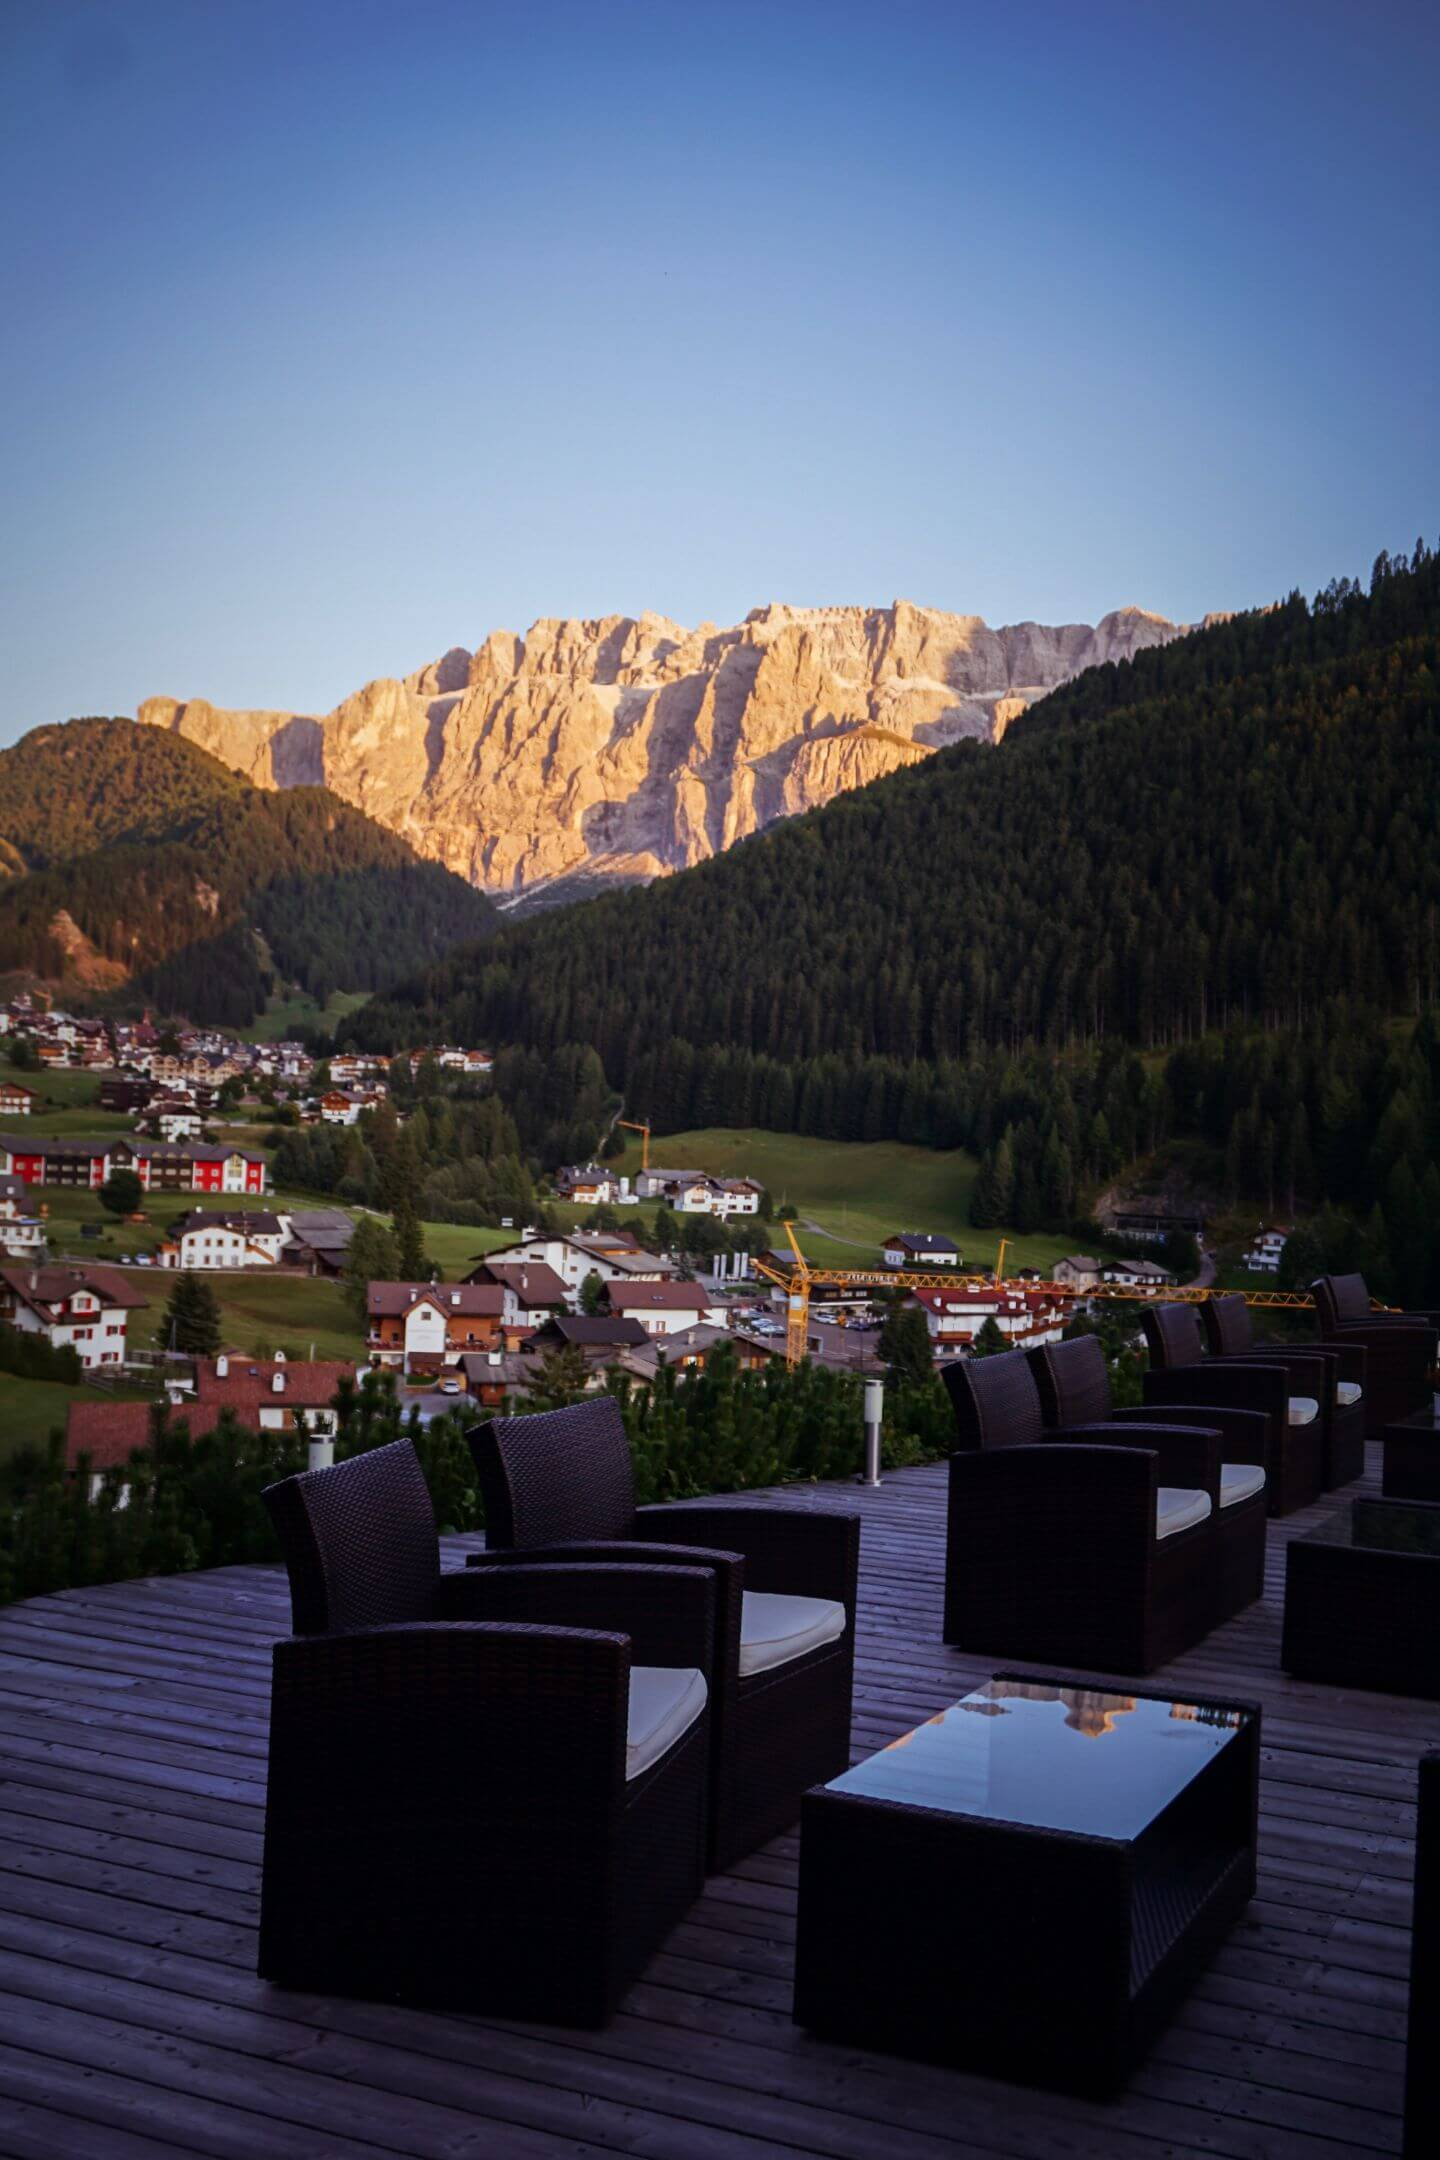 Hotel Rodella outdoor terrace - Best hotels in Selva, Val Gardena, Dolomites, Italy